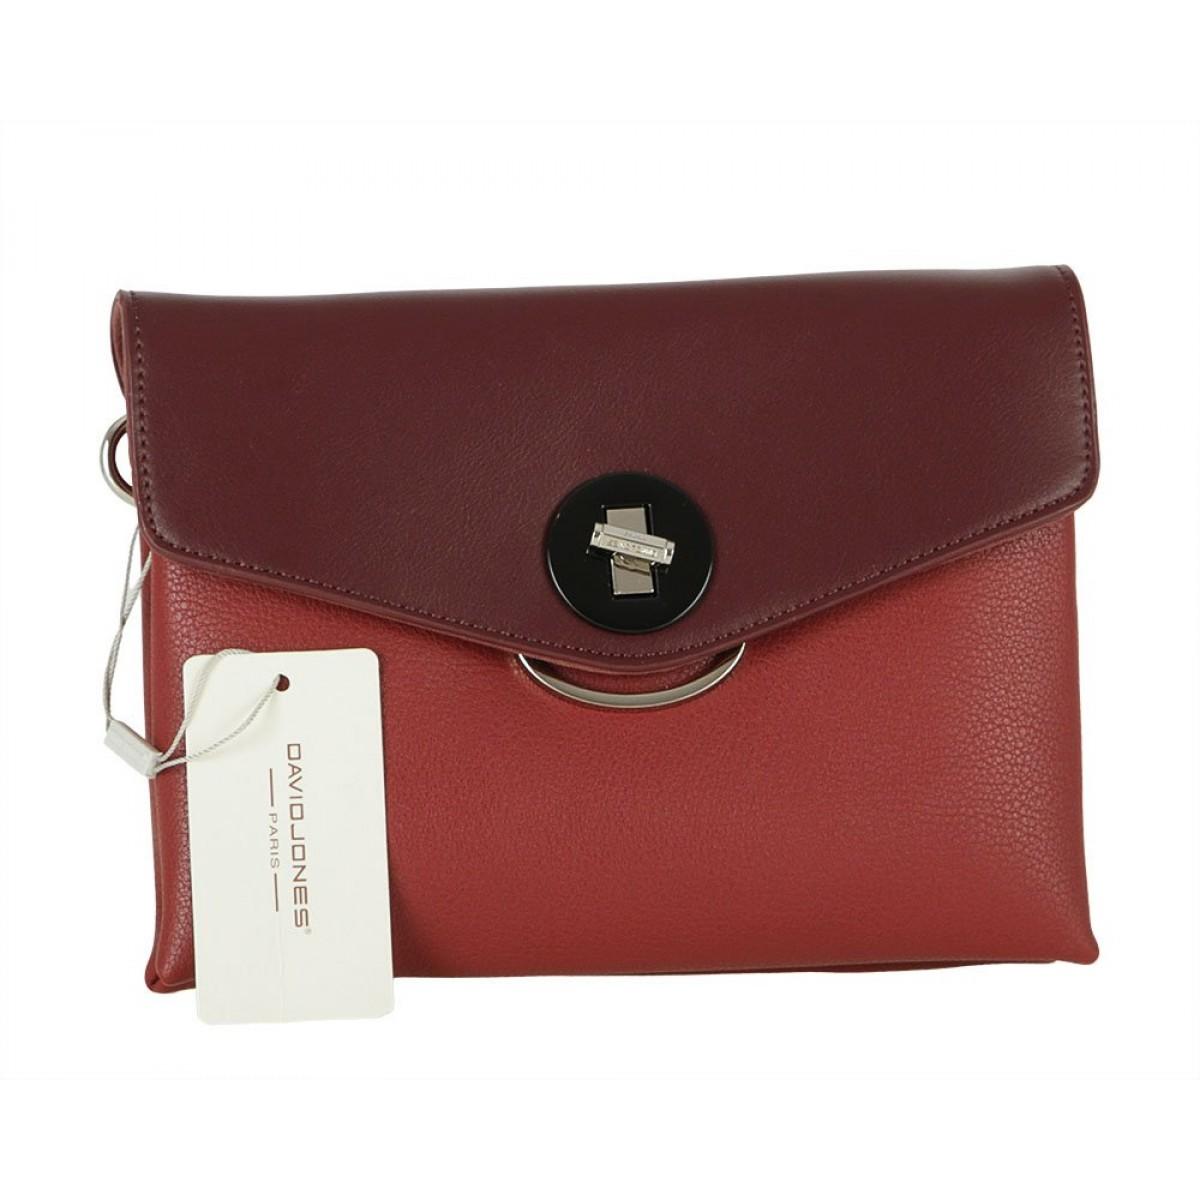 Жіноча сумка David Jones 6414-1 DARK RED